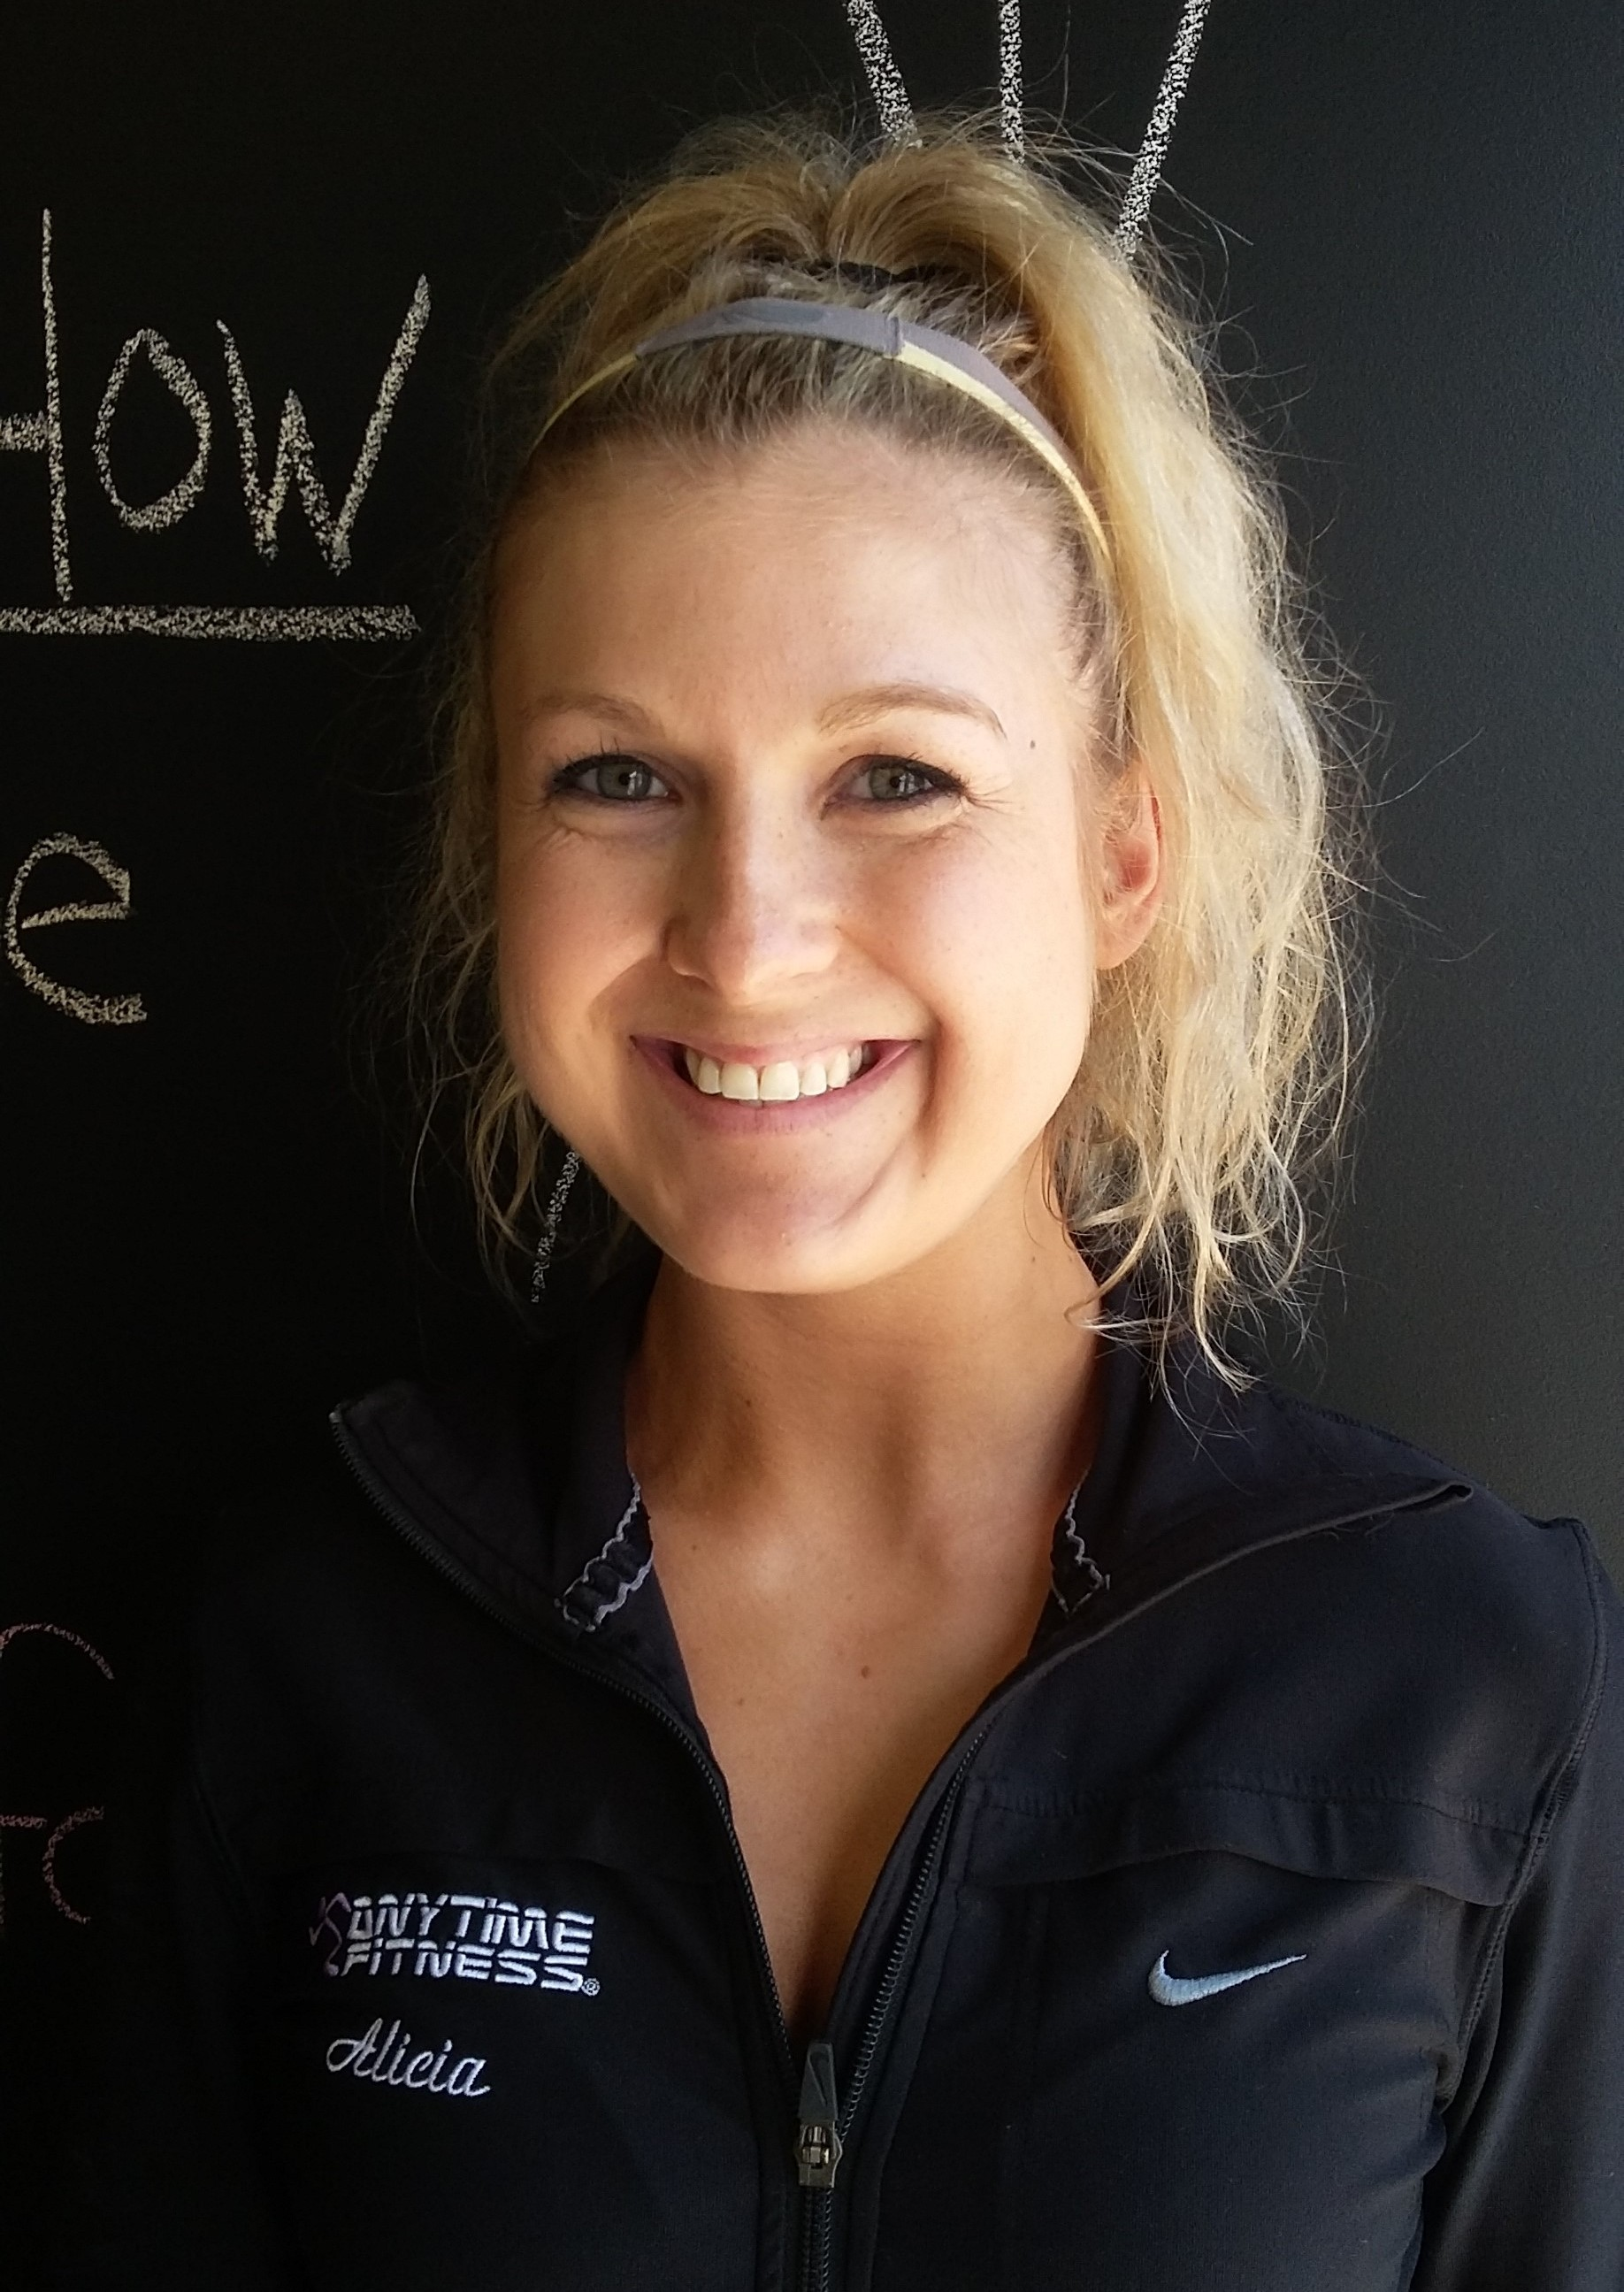 Alicia MacDougall